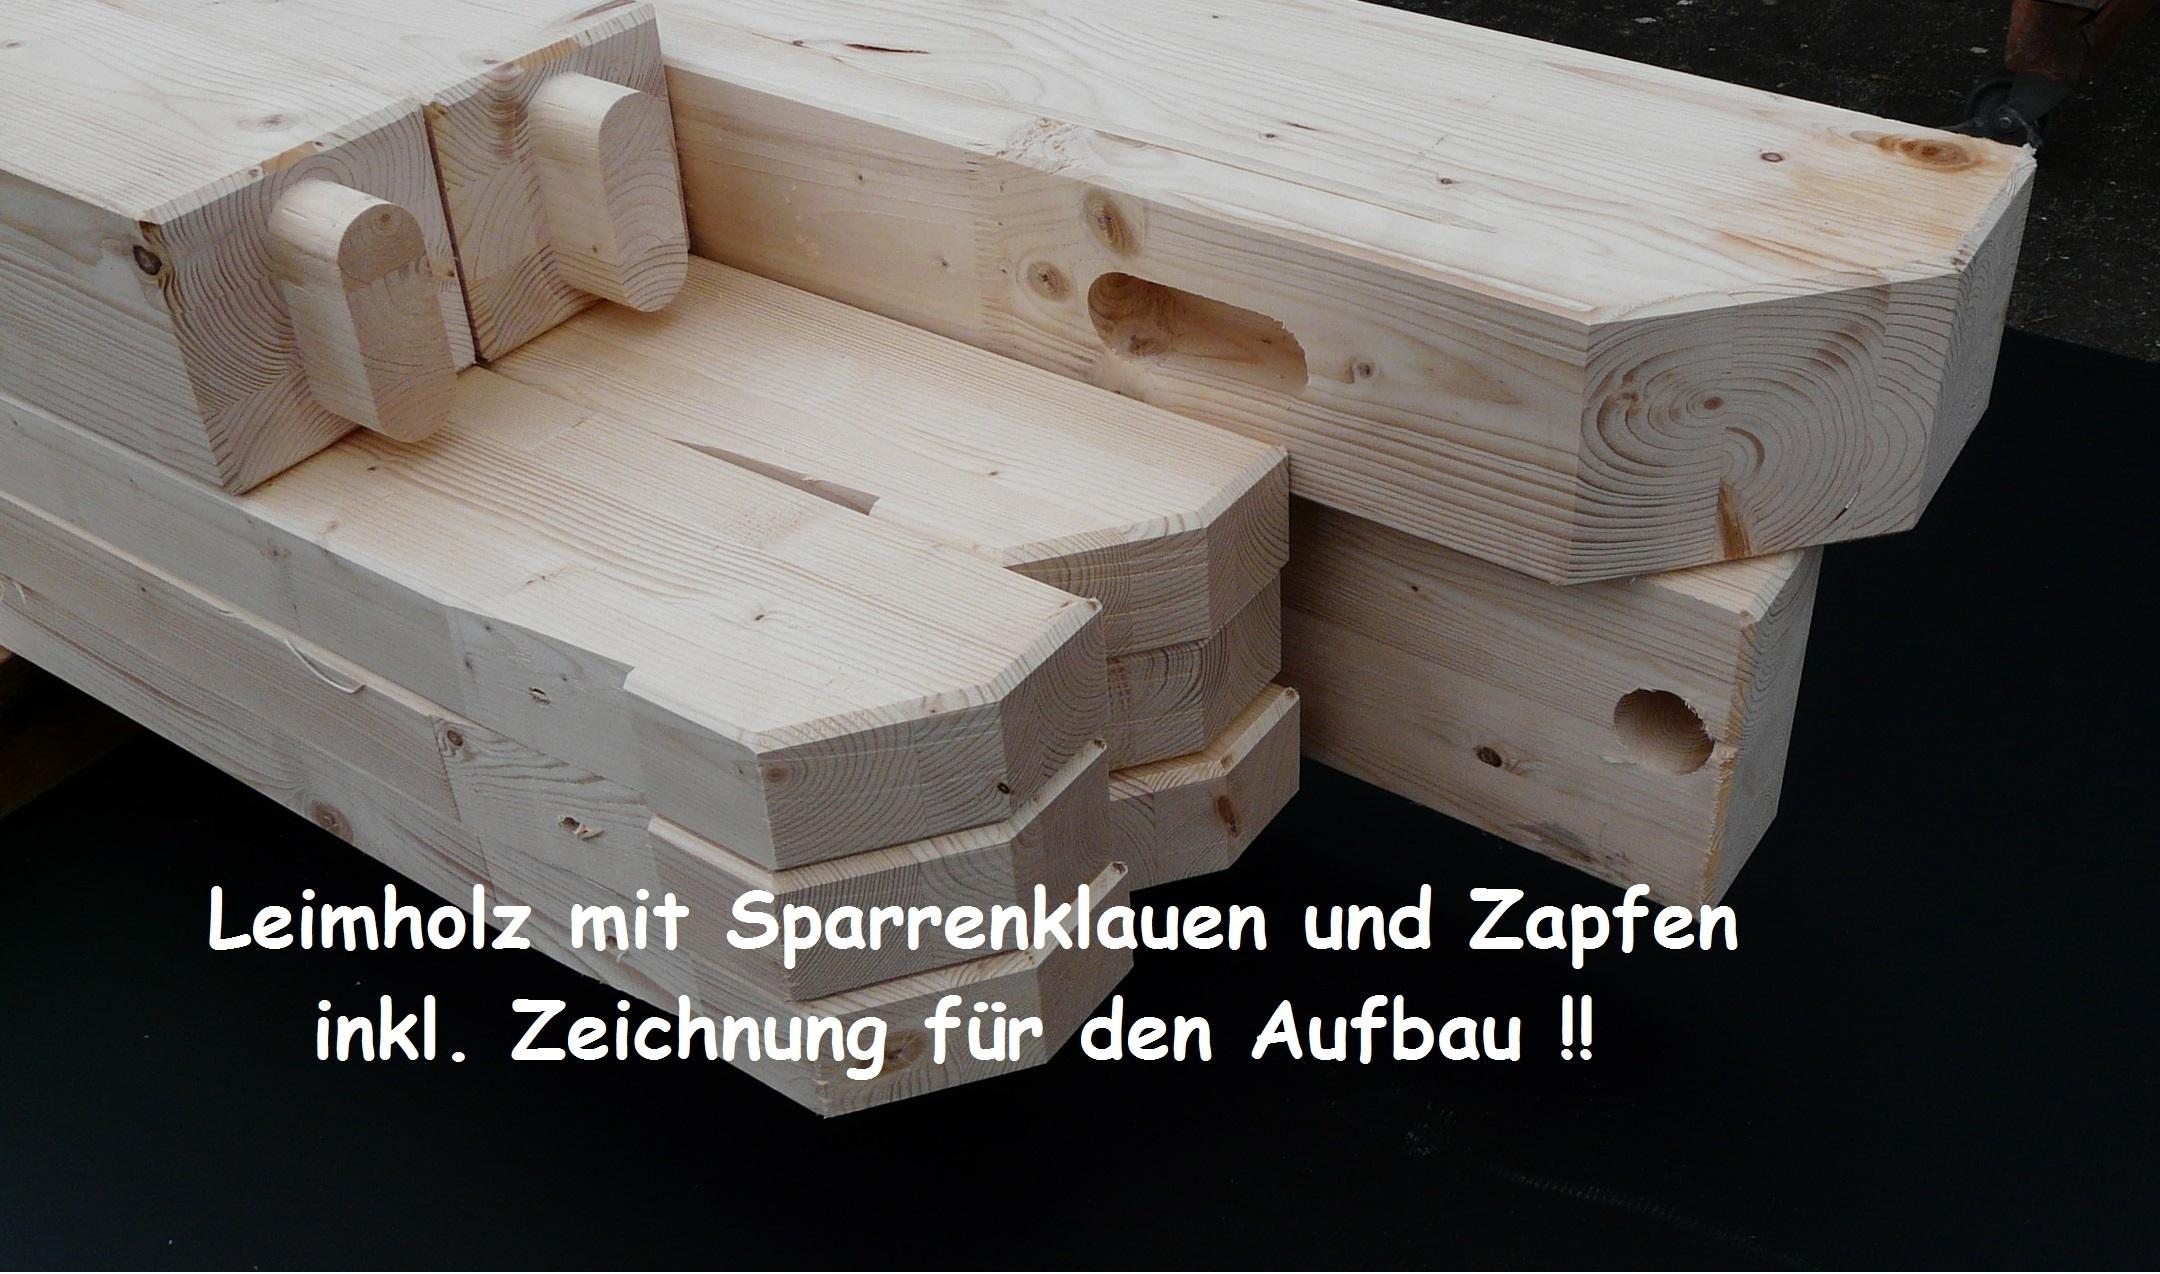 terrassendach komplett !! incl. holz ( abbund-gezapft ) & 16mm, Moderne